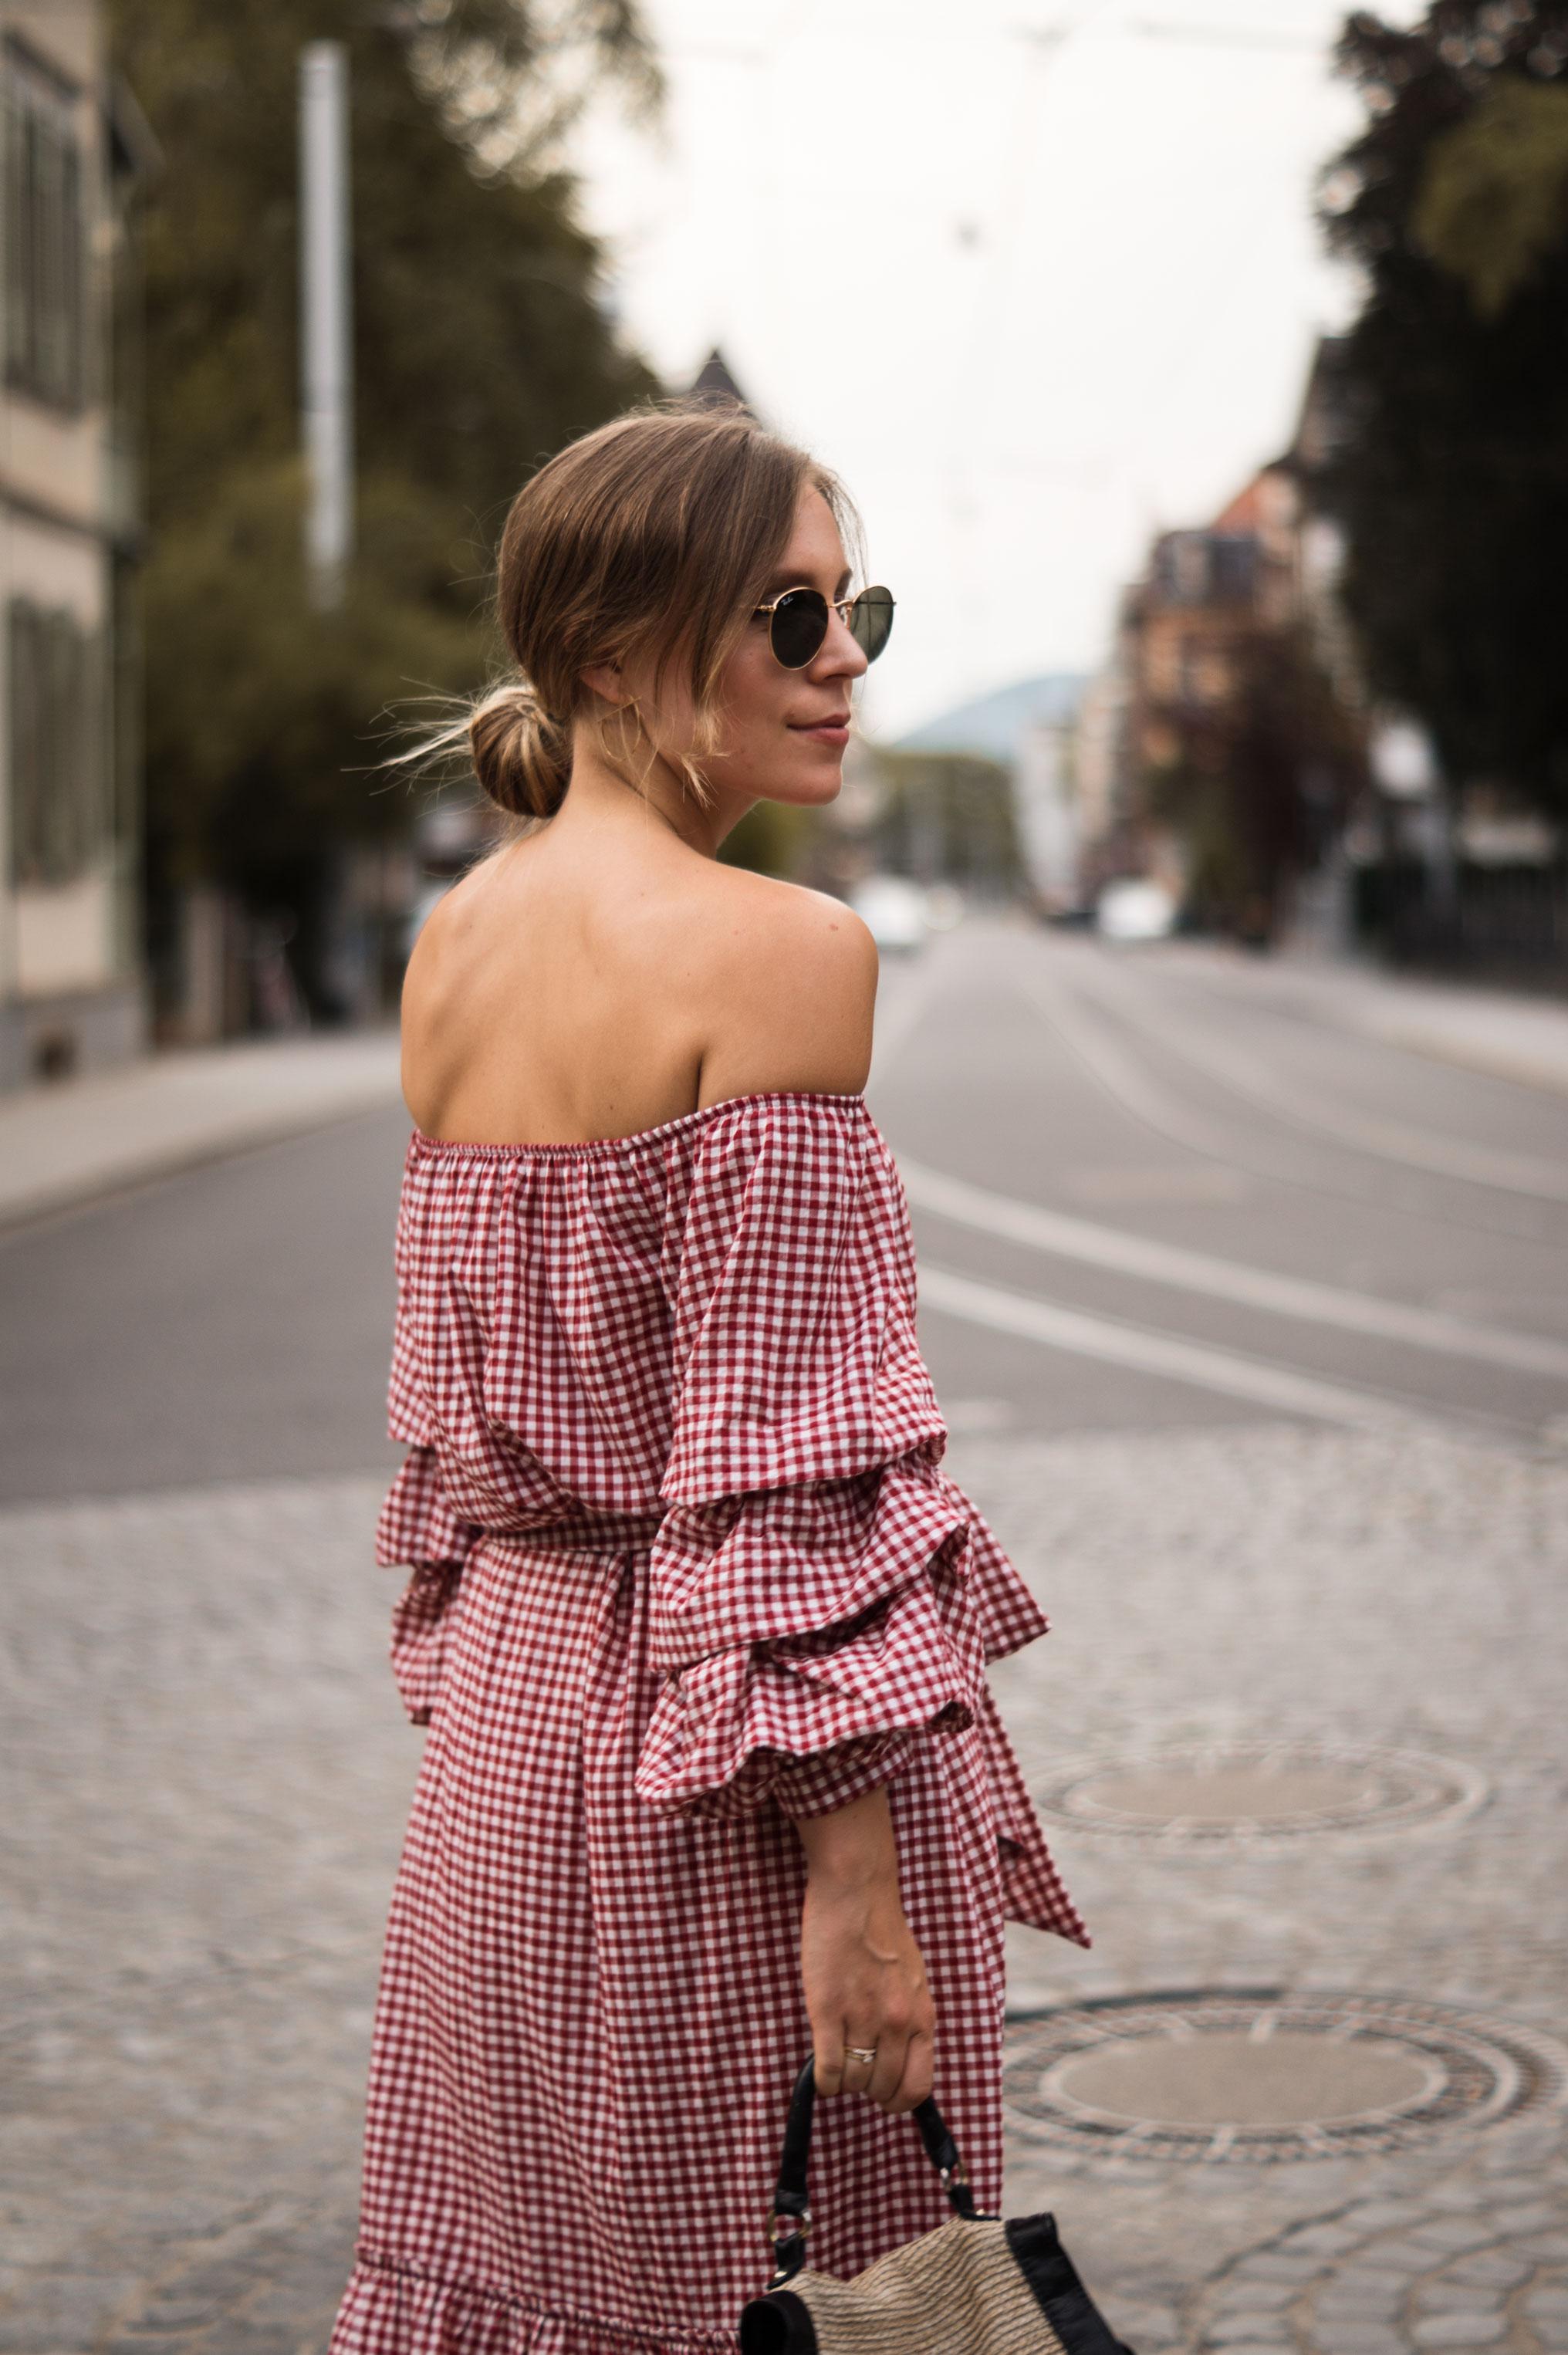 rotes Karokleid Zara off shoulder gingham Streetstyle Heidelberg Sariety Modeblog Fashionblogger-7